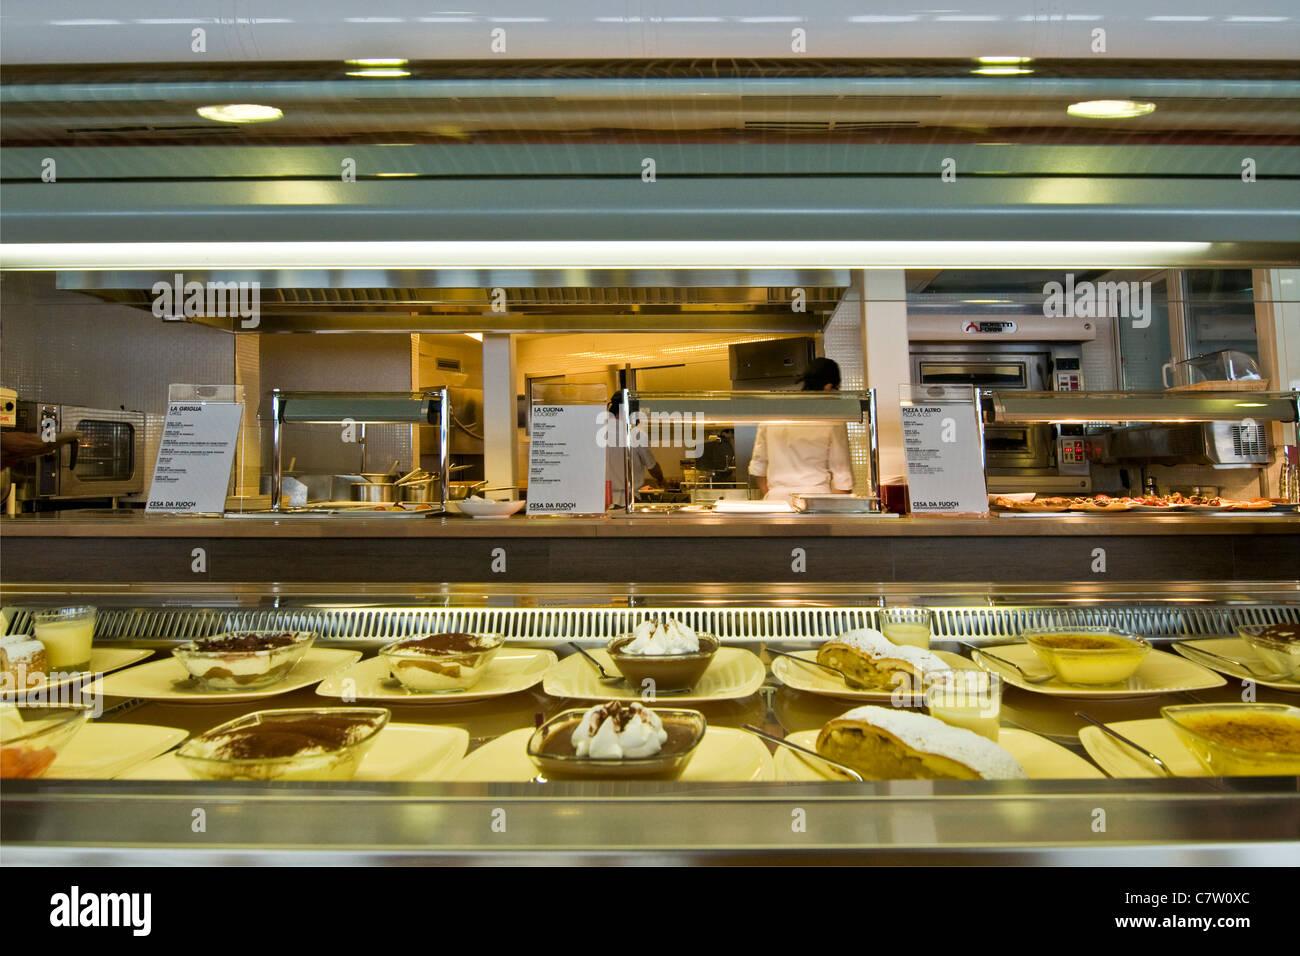 Cafeteria interiors - Stock Image